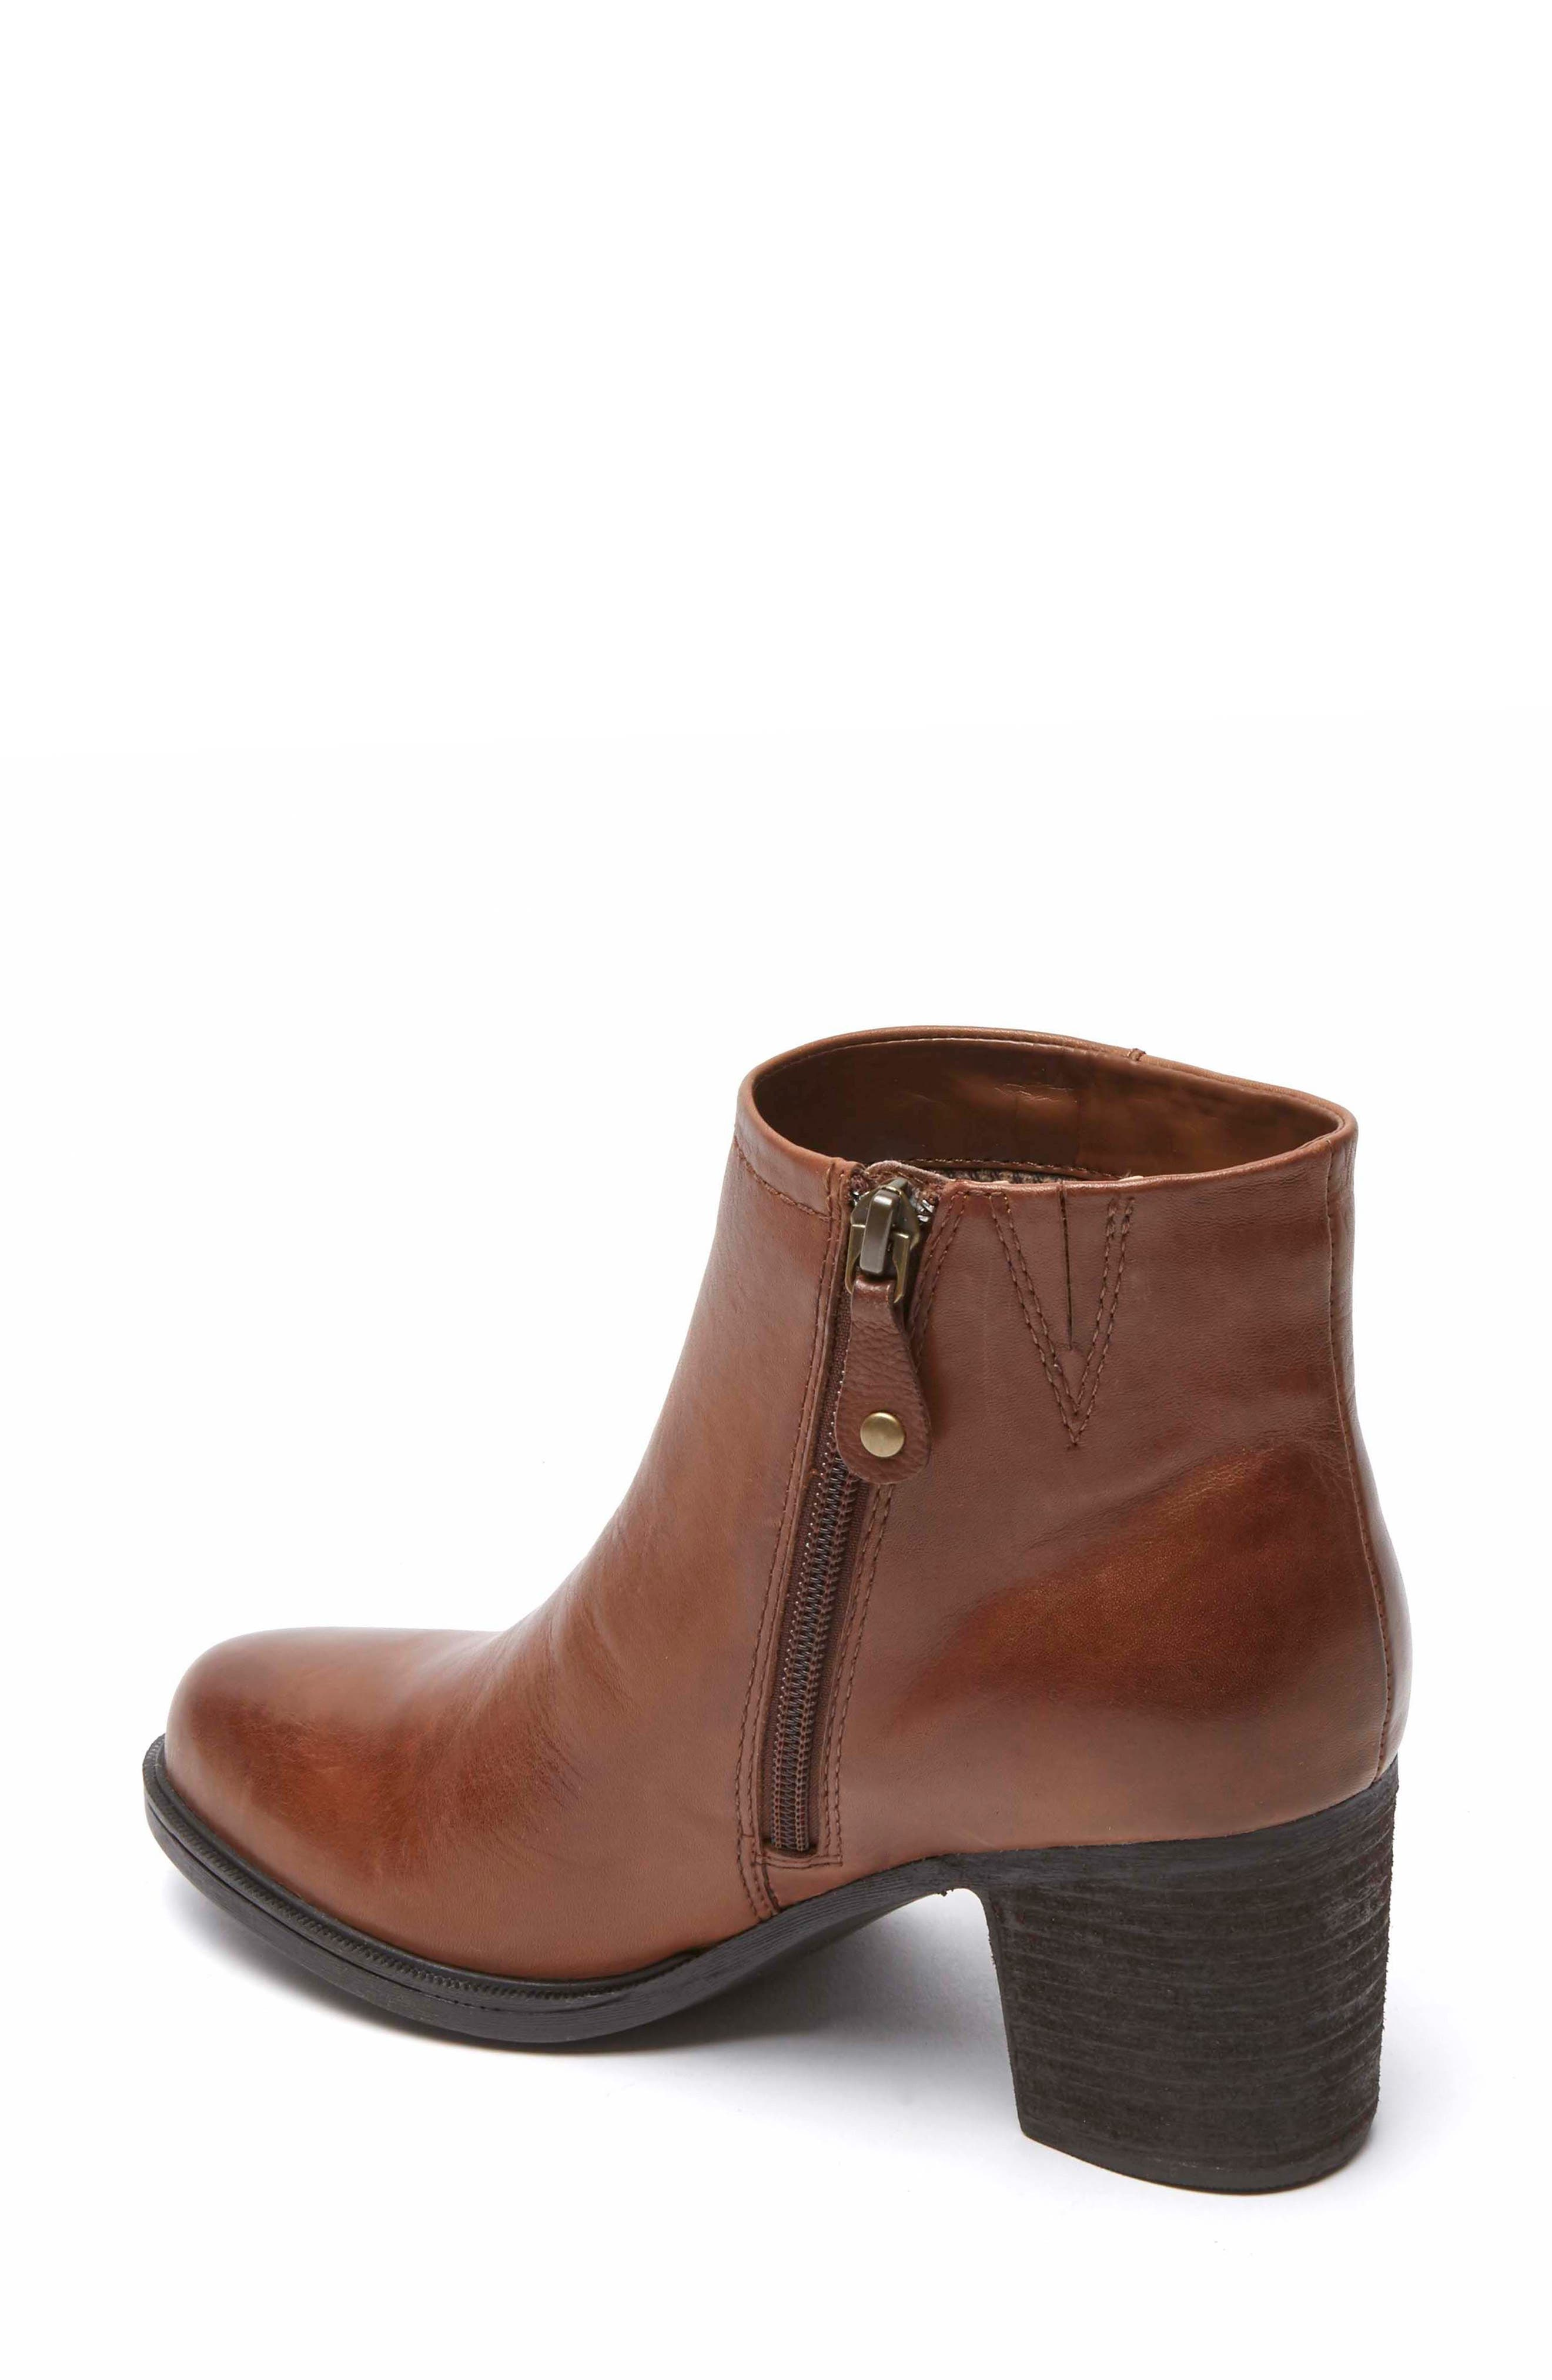 Natashya Bootie,                             Alternate thumbnail 2, color,                             Almond Leather